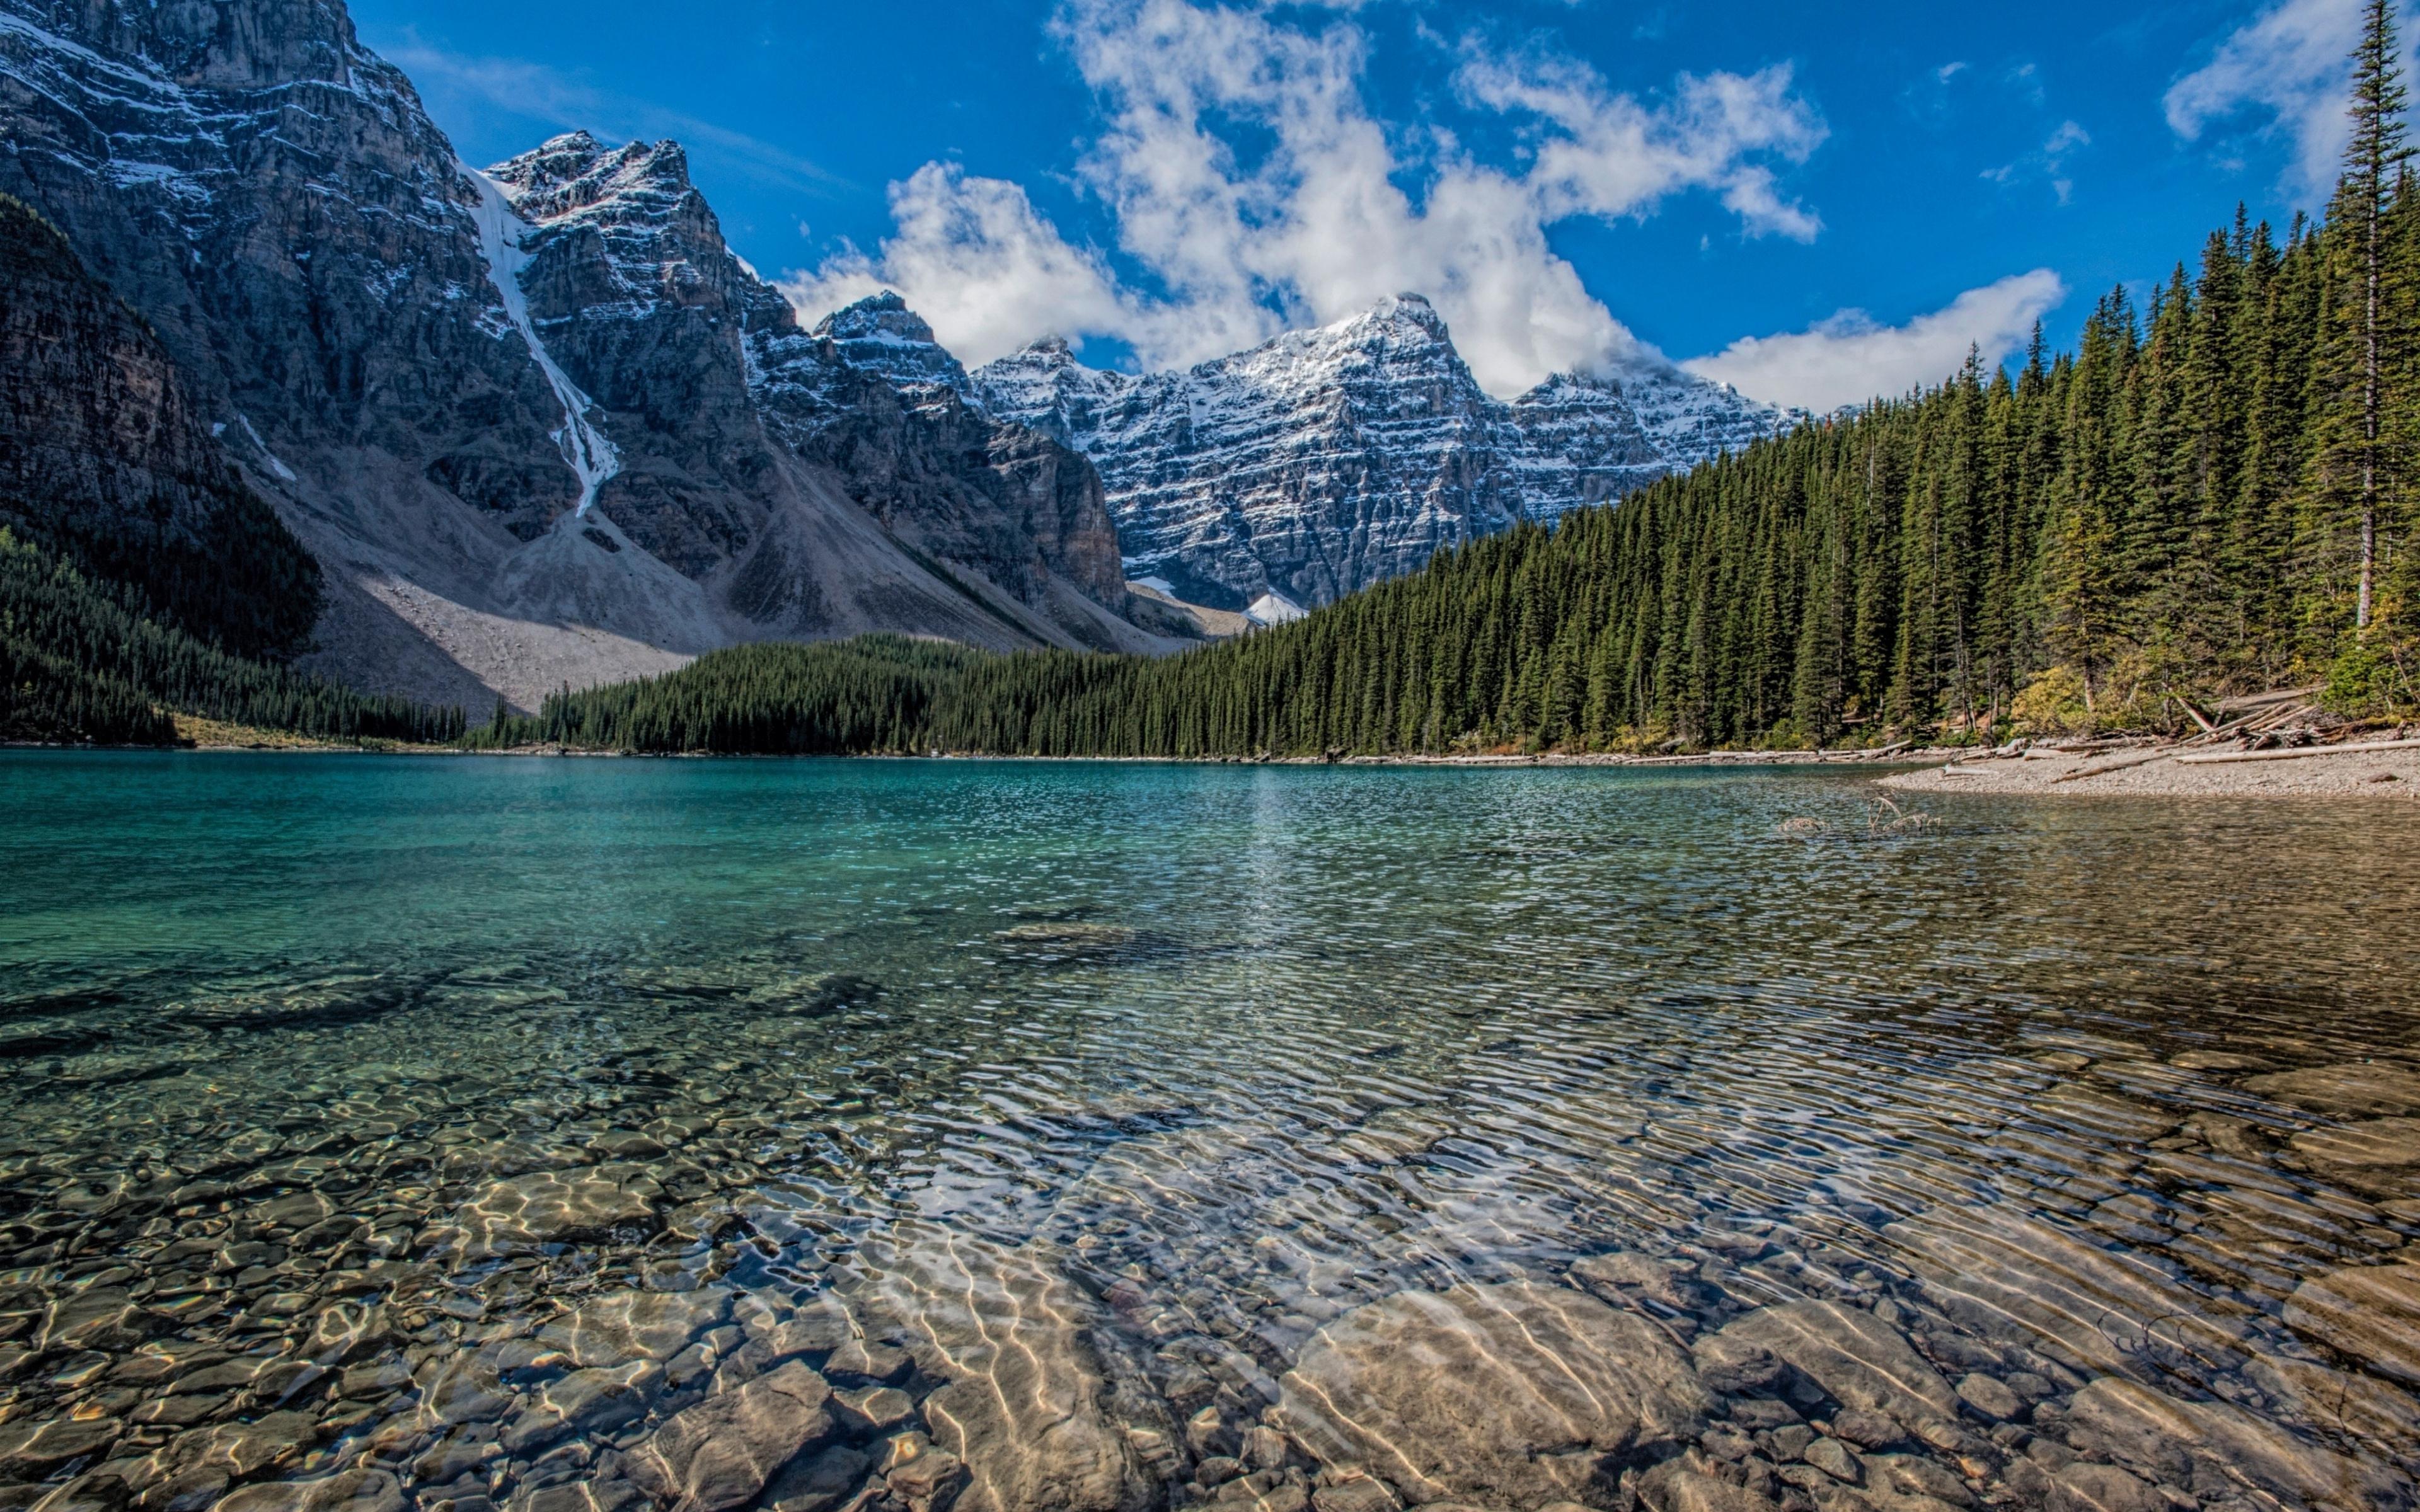 3840x2400 wallpaper,natural landscape,nature,mountain,body of water,mountainous landforms